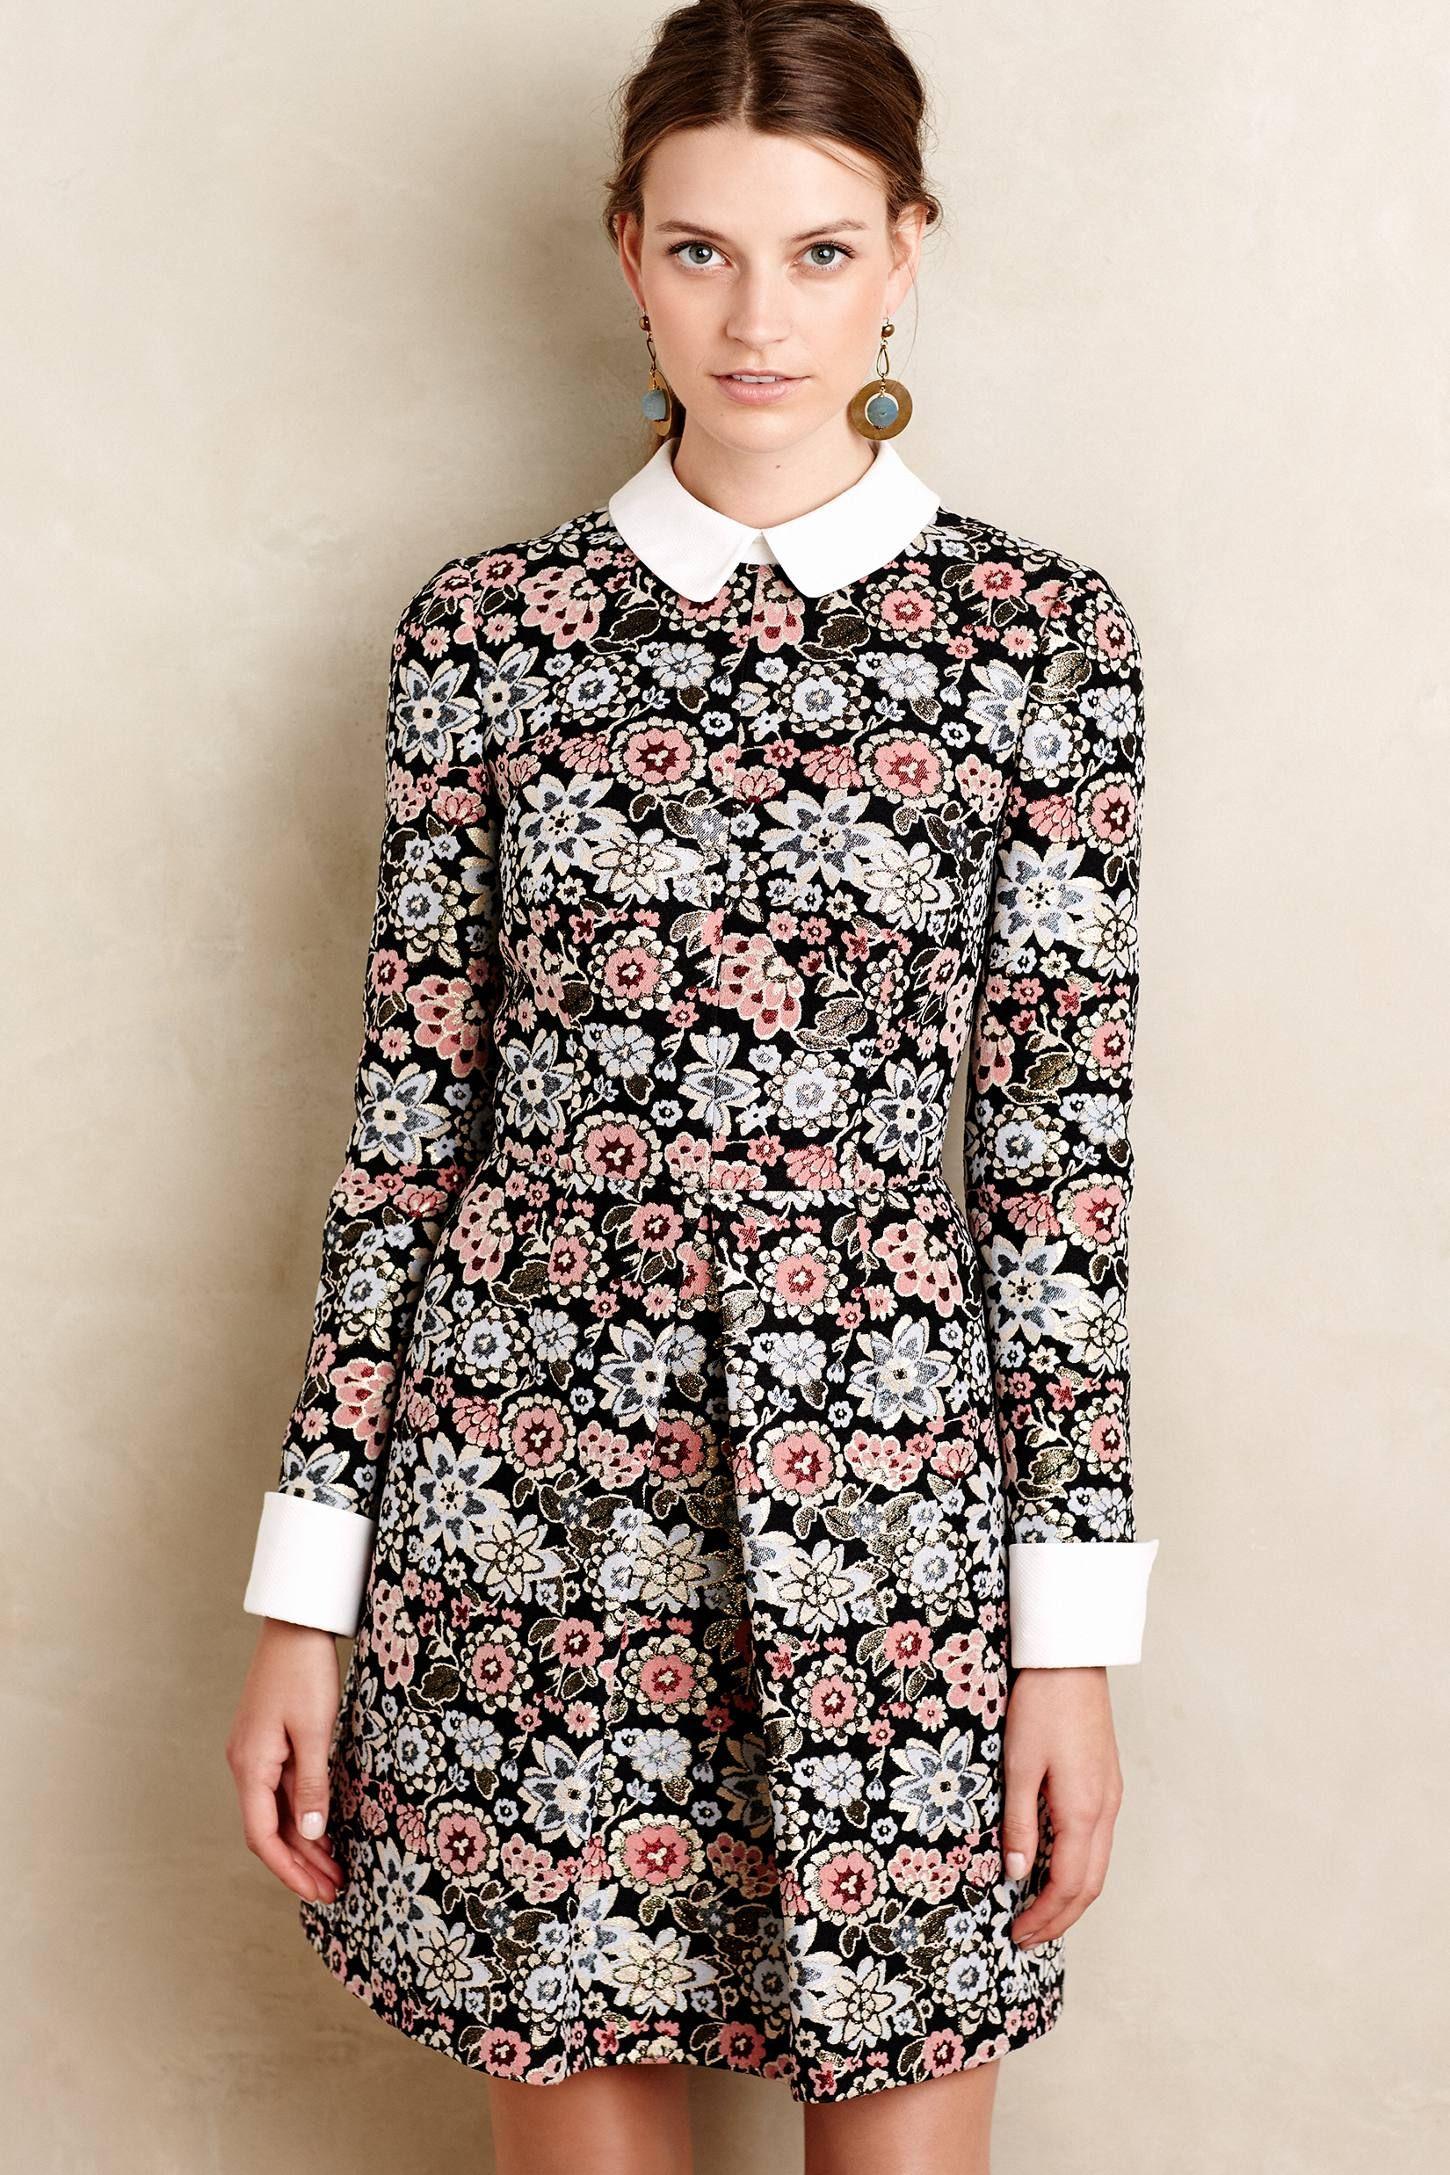 f279a1164f5 at anthropologie Brocade Blossom Mini Dress